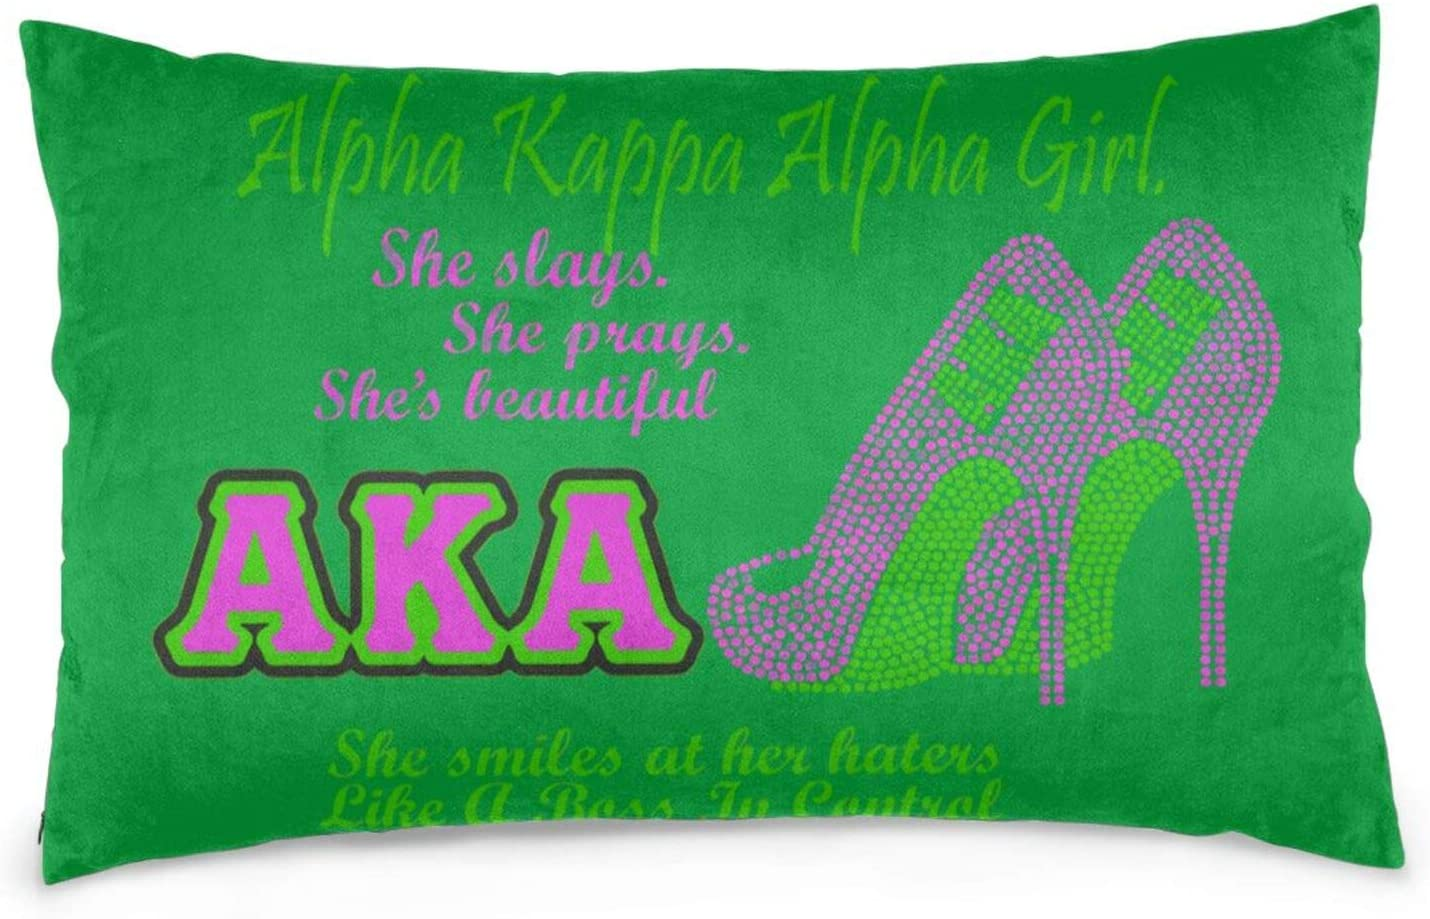 Dawiine Aka Decor Pillowcases Pillow Protectors Pillow Cases Bedroom Home Car Decor